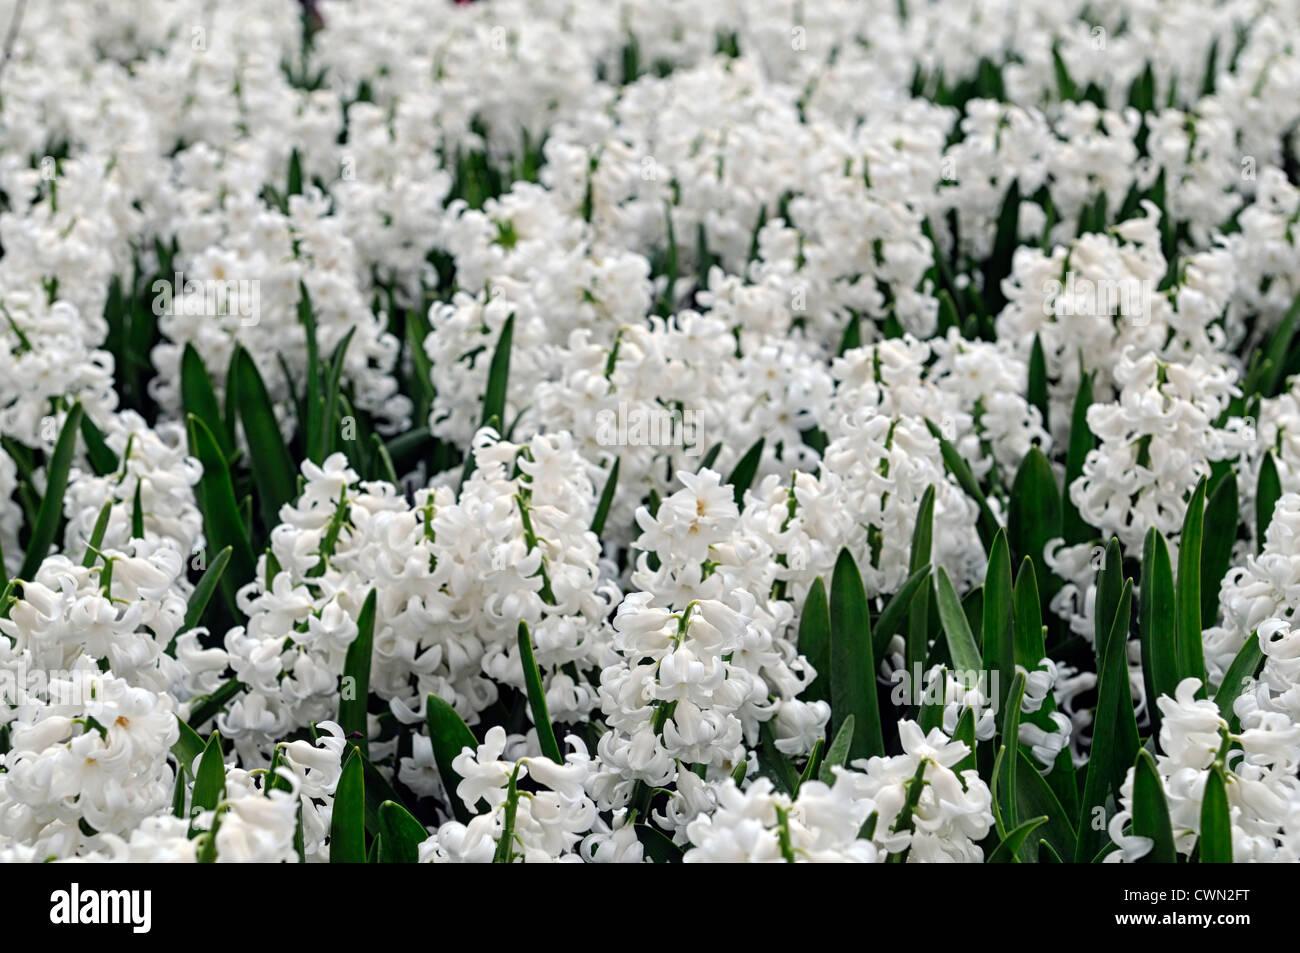 Hyacinth hyacinthus orientalis linnocence white flower flowers hyacinth hyacinthus orientalis linnocence white flower flowers blooms blossoms bed beds border spring bulb display mightylinksfo